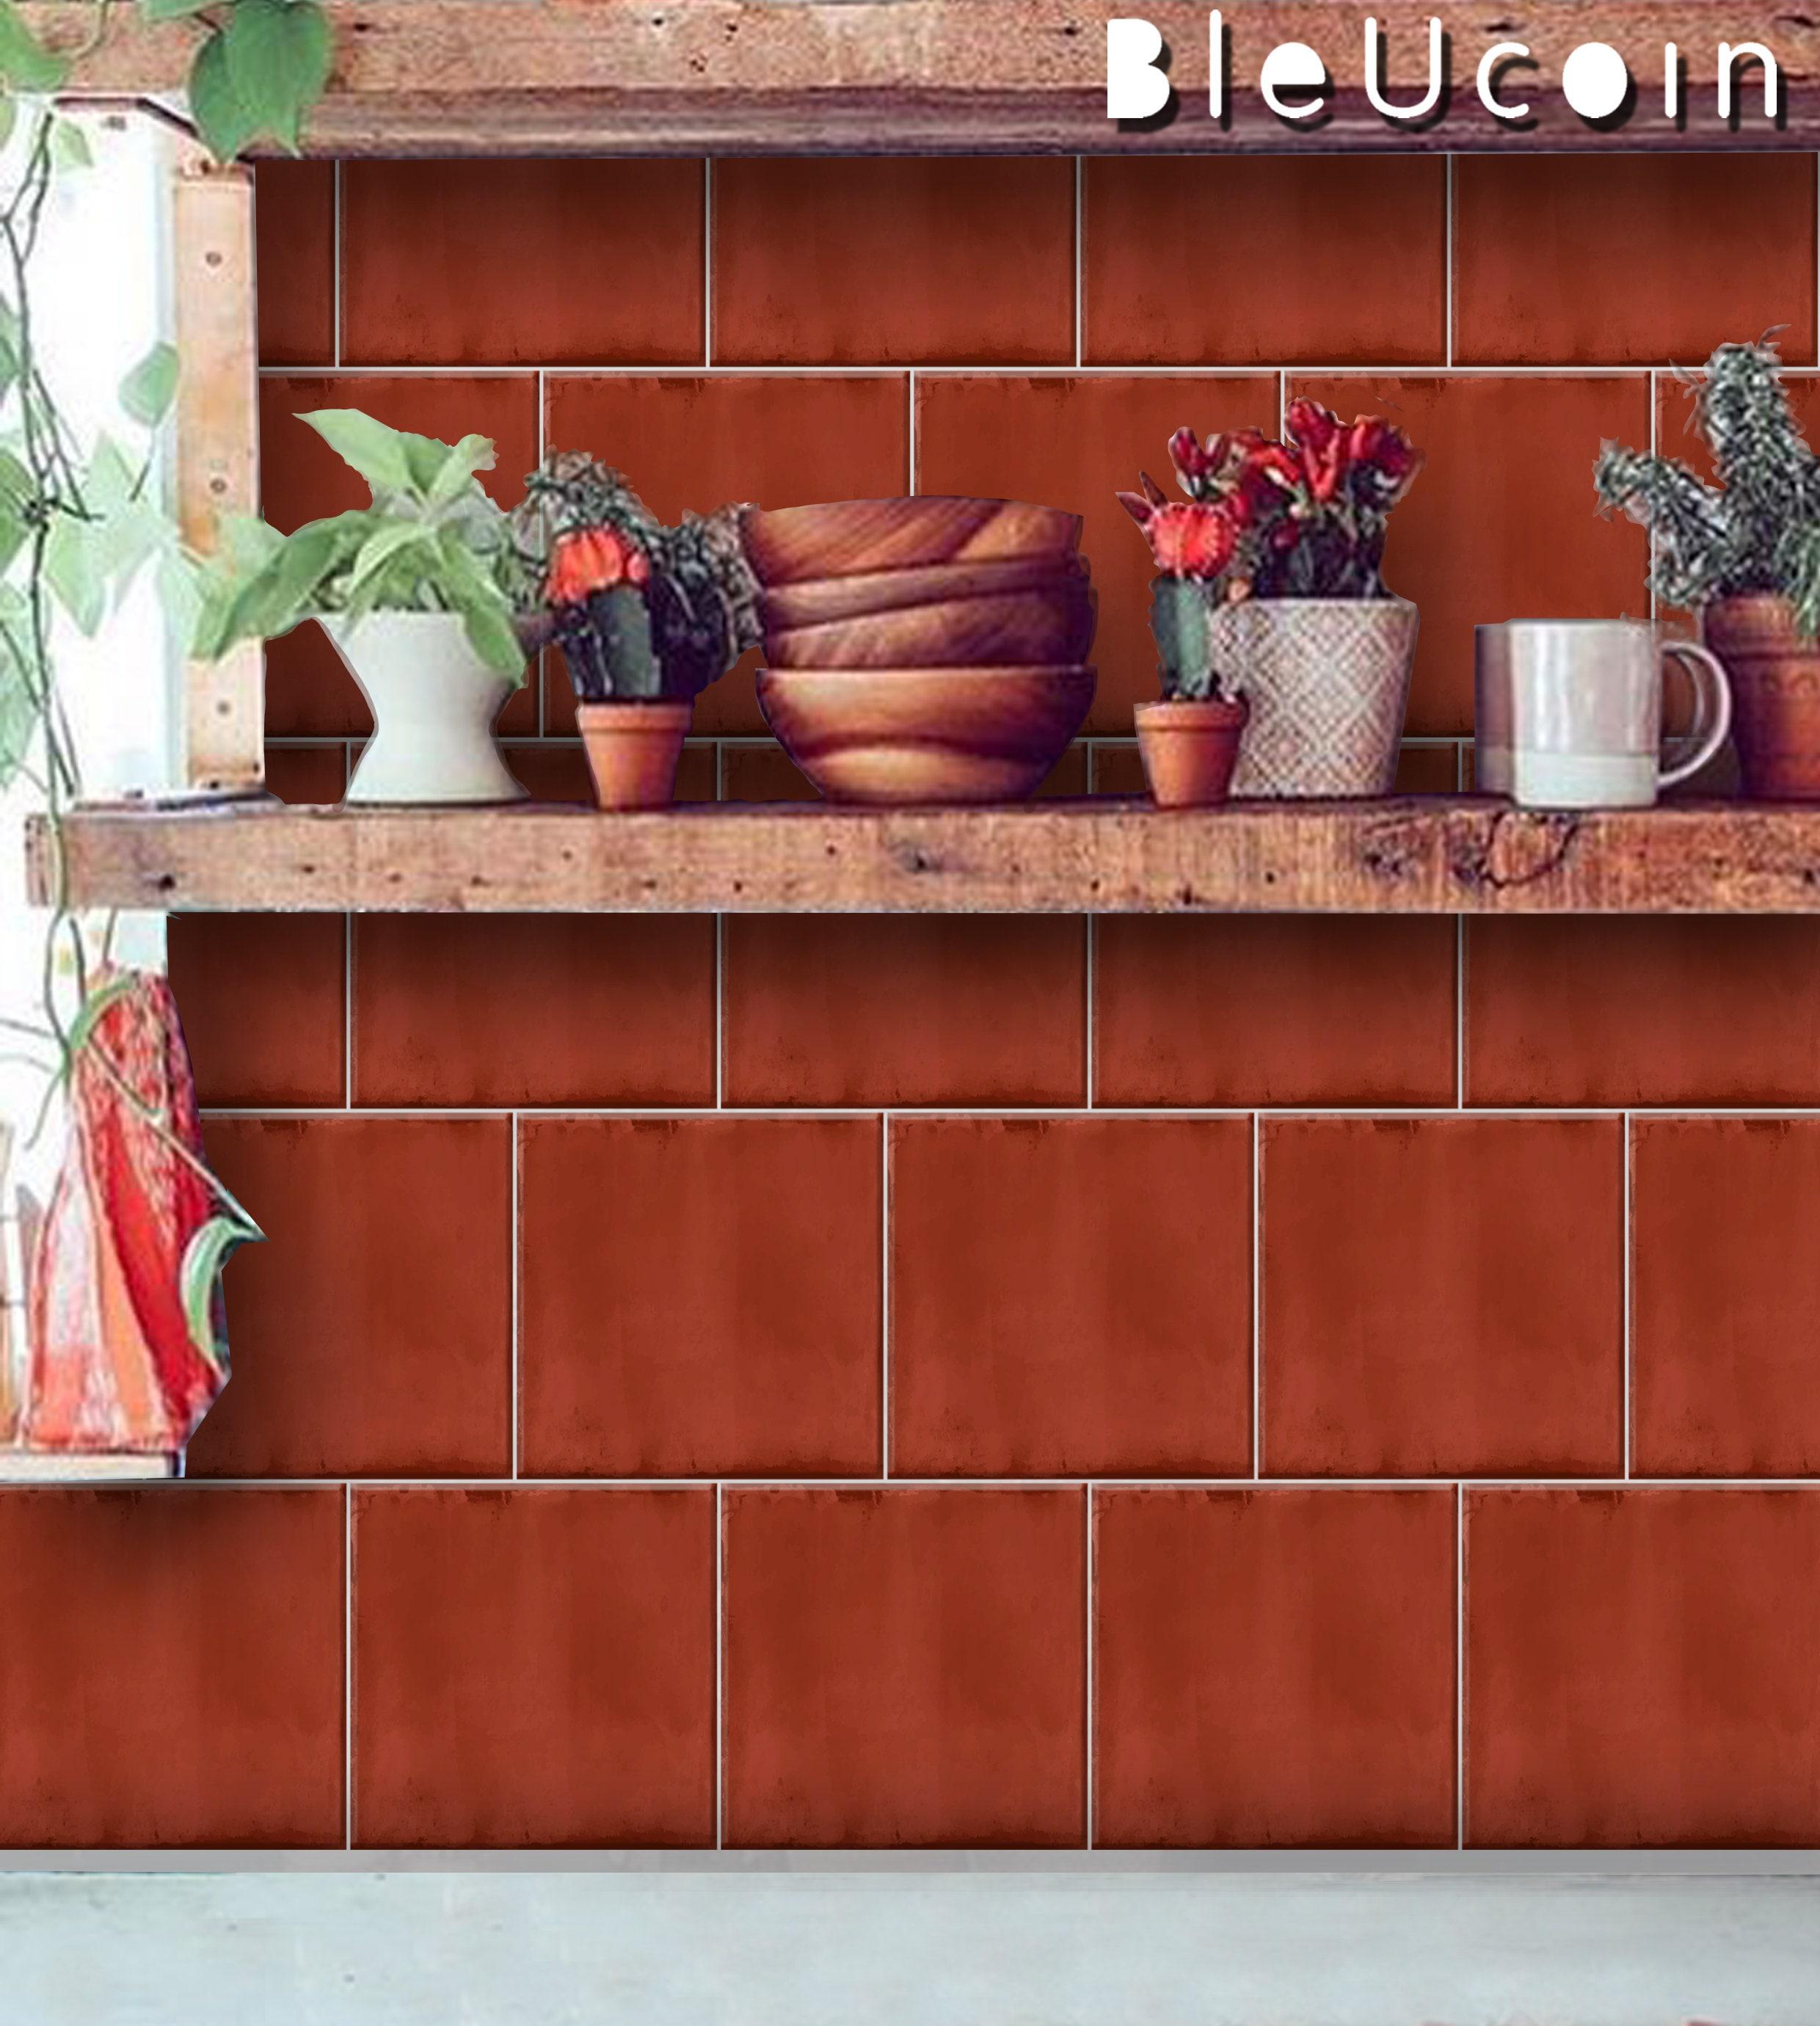 Plain Terracotta Tile Wall Stair Floor Self Adhesive Vinyl Stickers Kitchen Bathroom Backsplash Carrelage Decal Peel